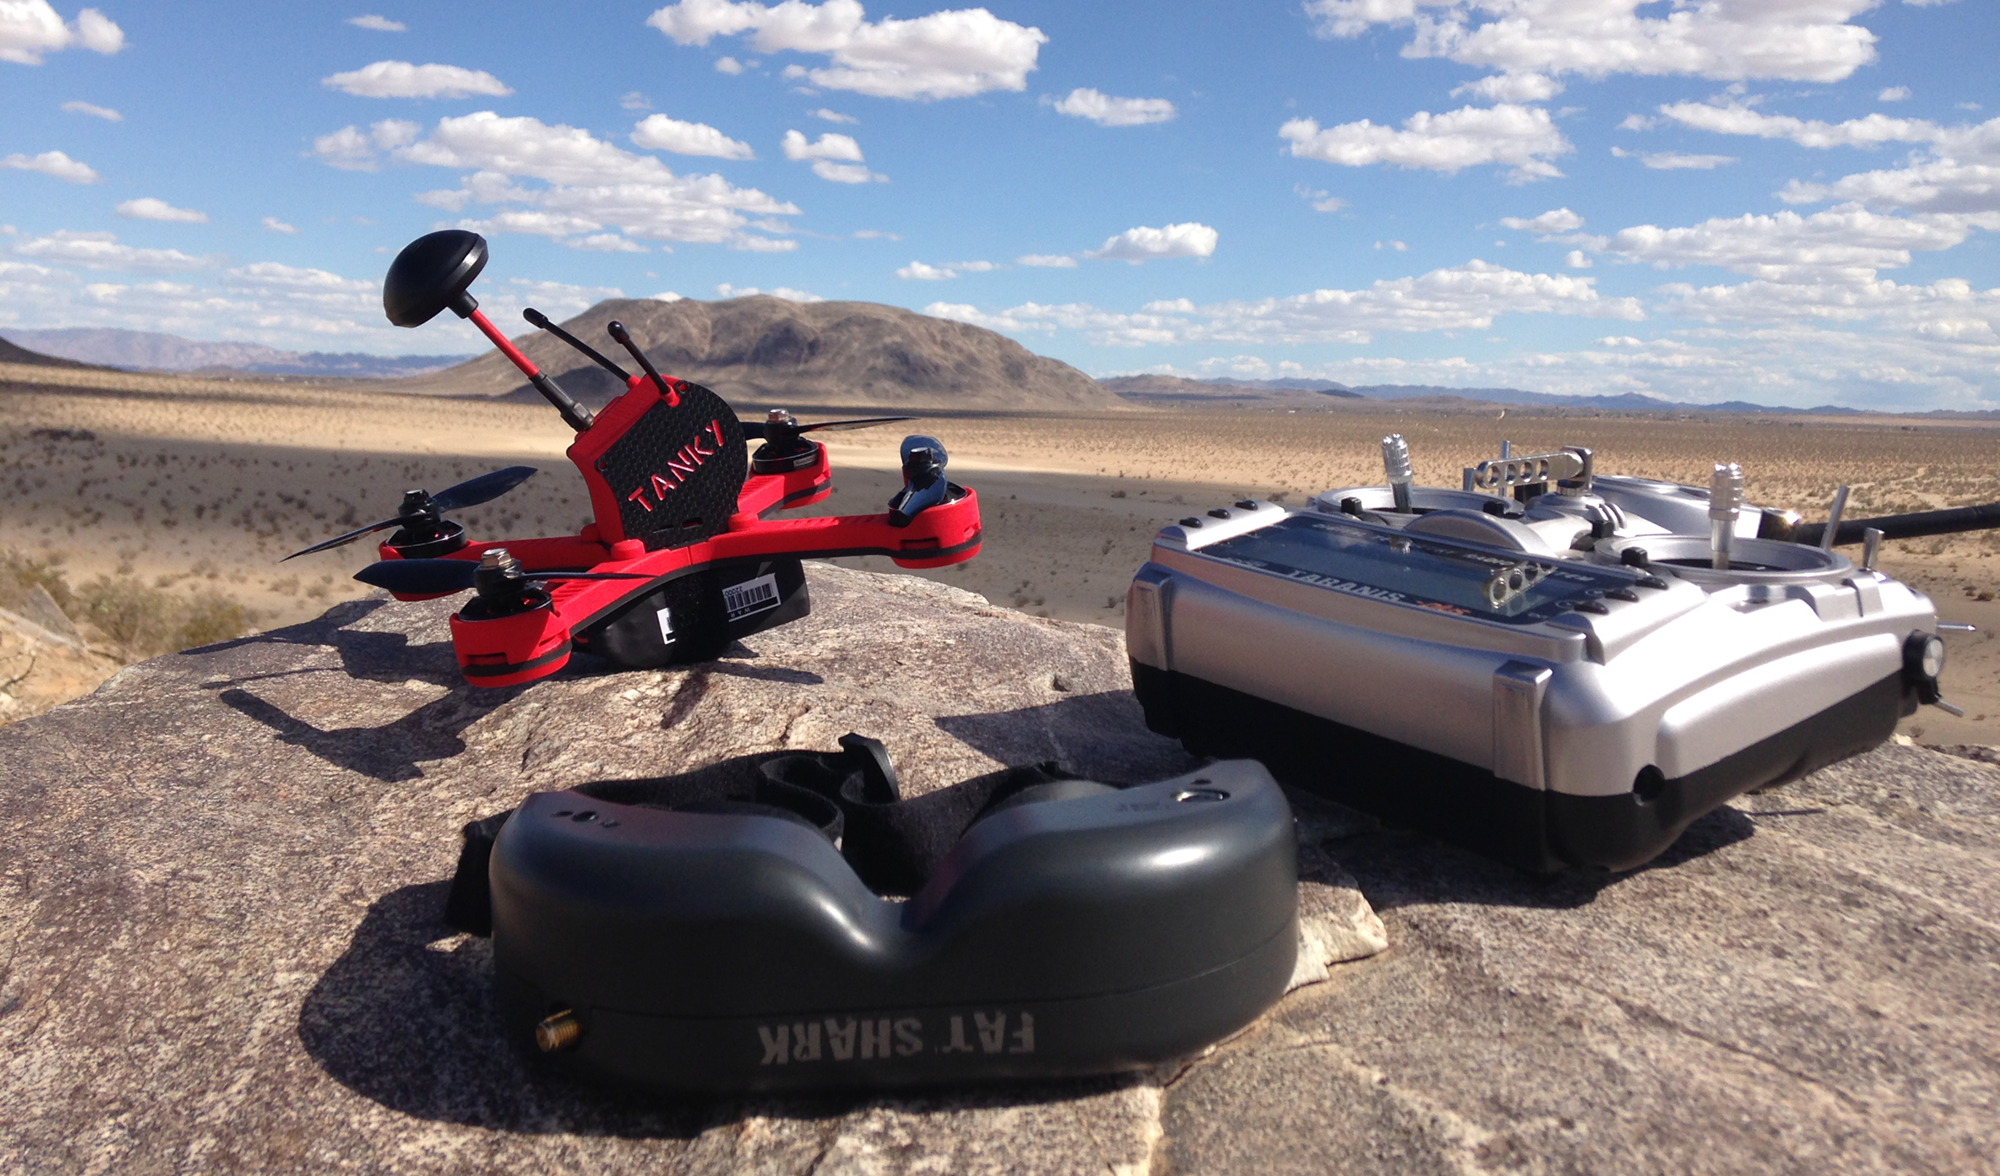 Tanky drone in the desert.